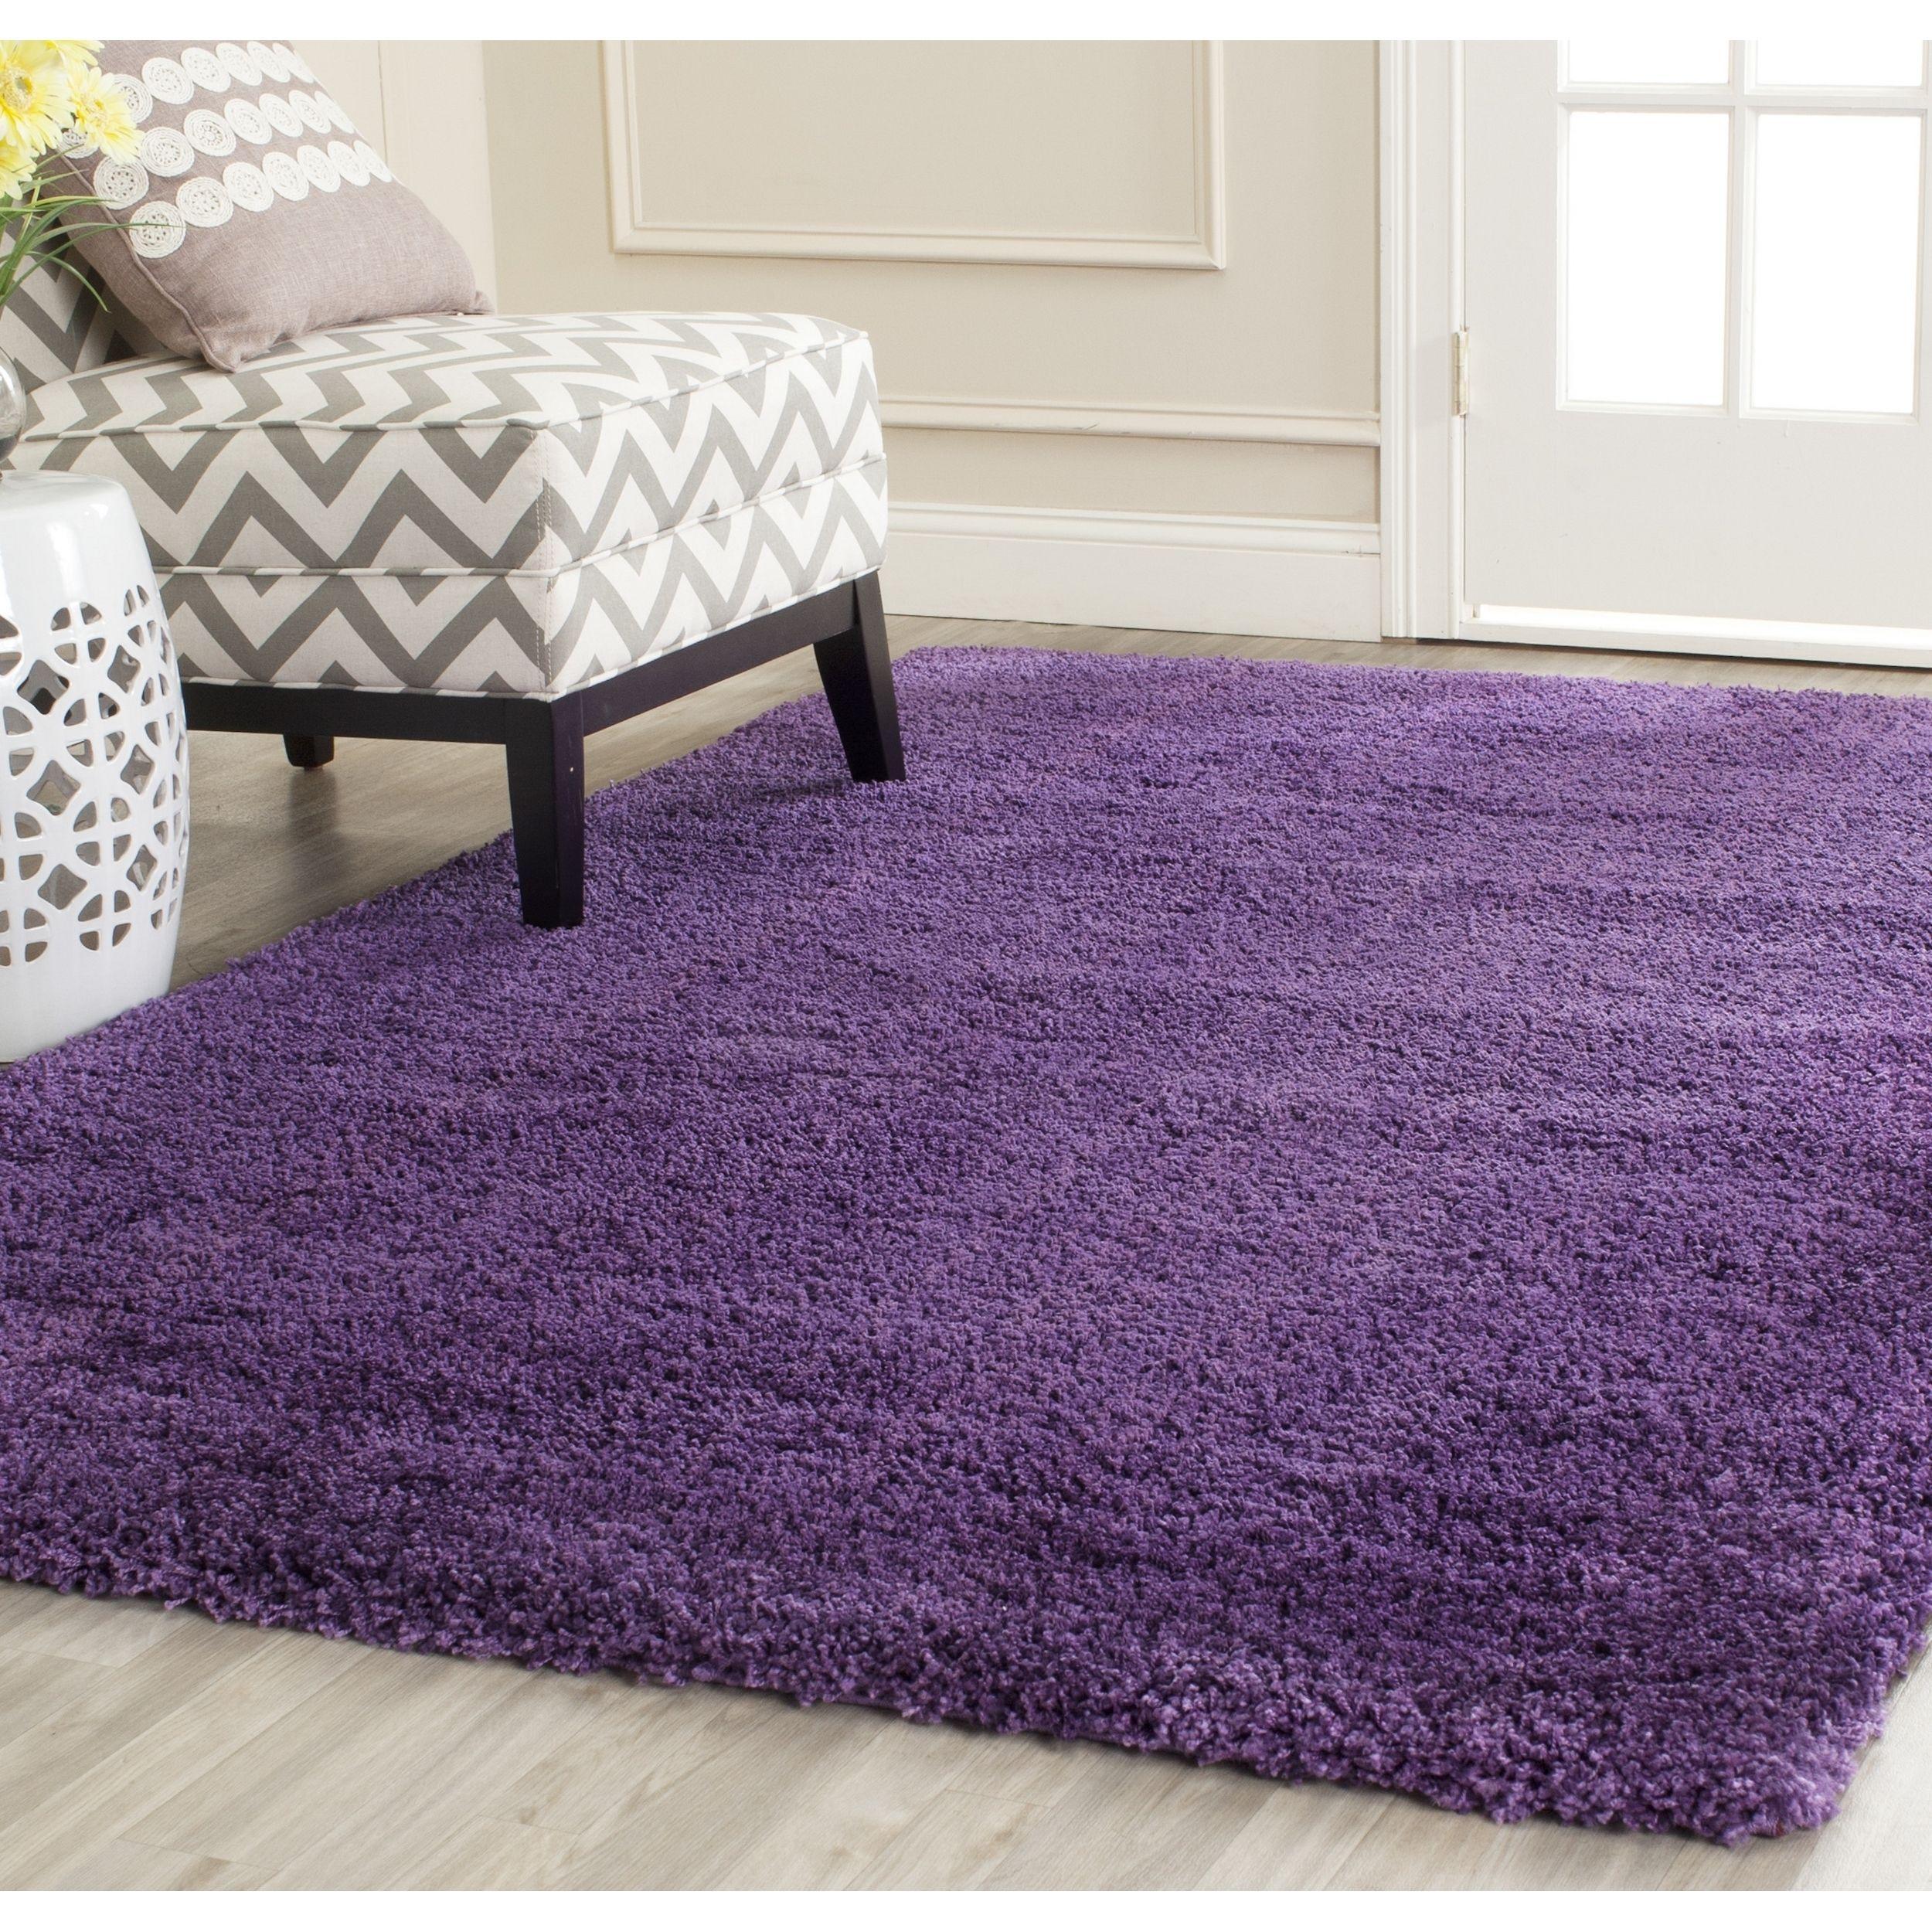 Safavieh Milan Shag Purple Rug 10 X 14 Sg180 7373 10